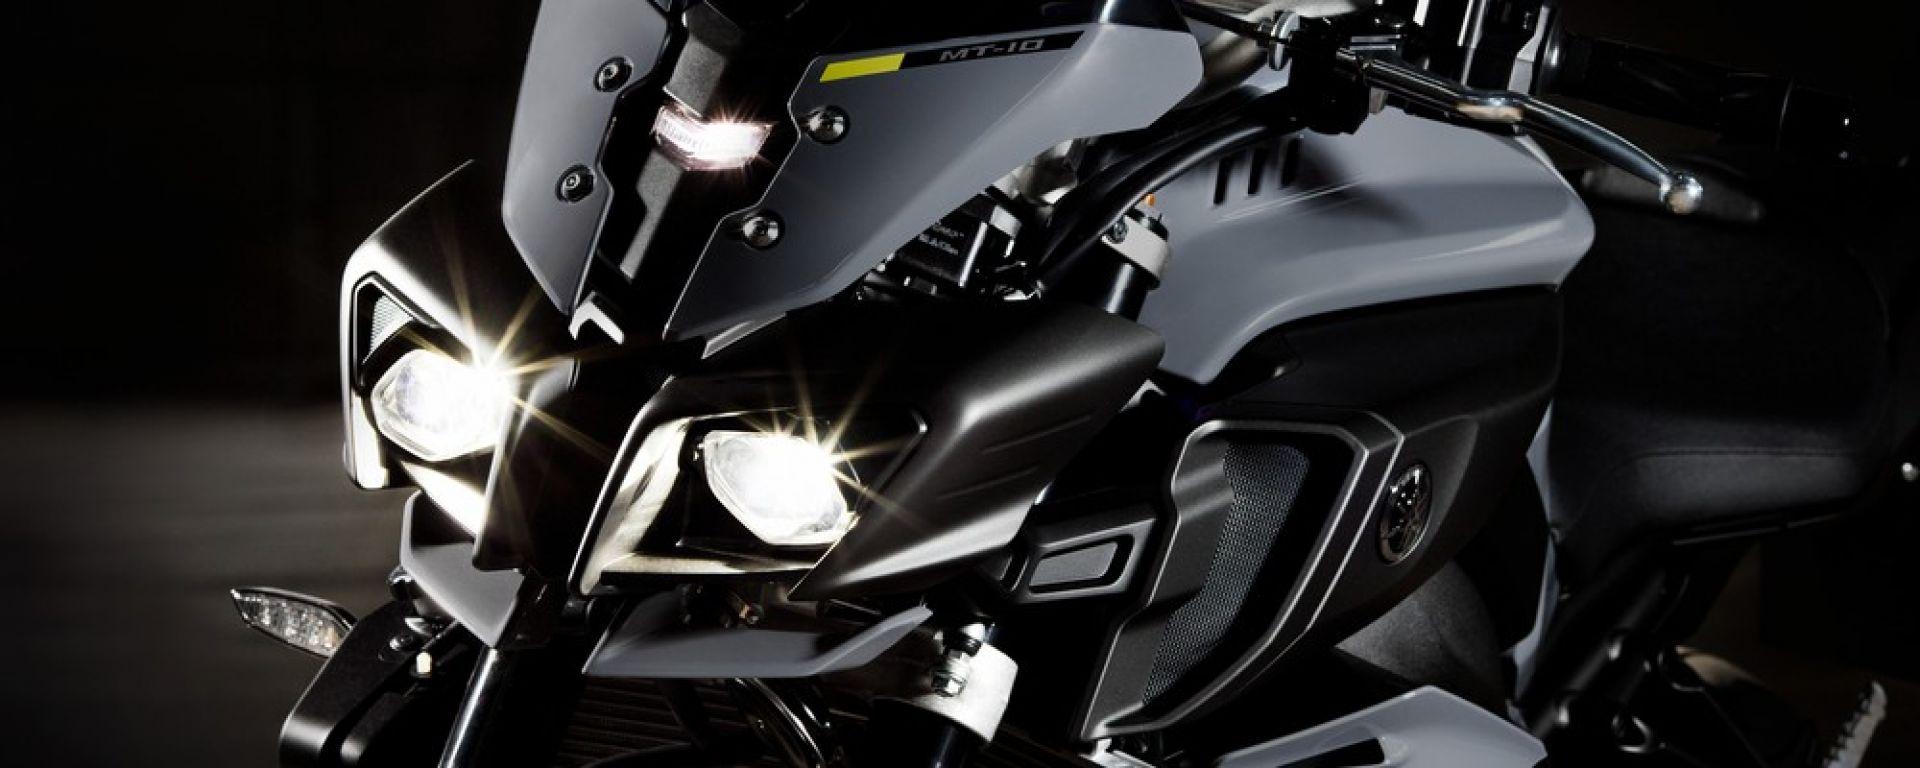 Yamaha MT-10: 160 cv a 12.990 euro